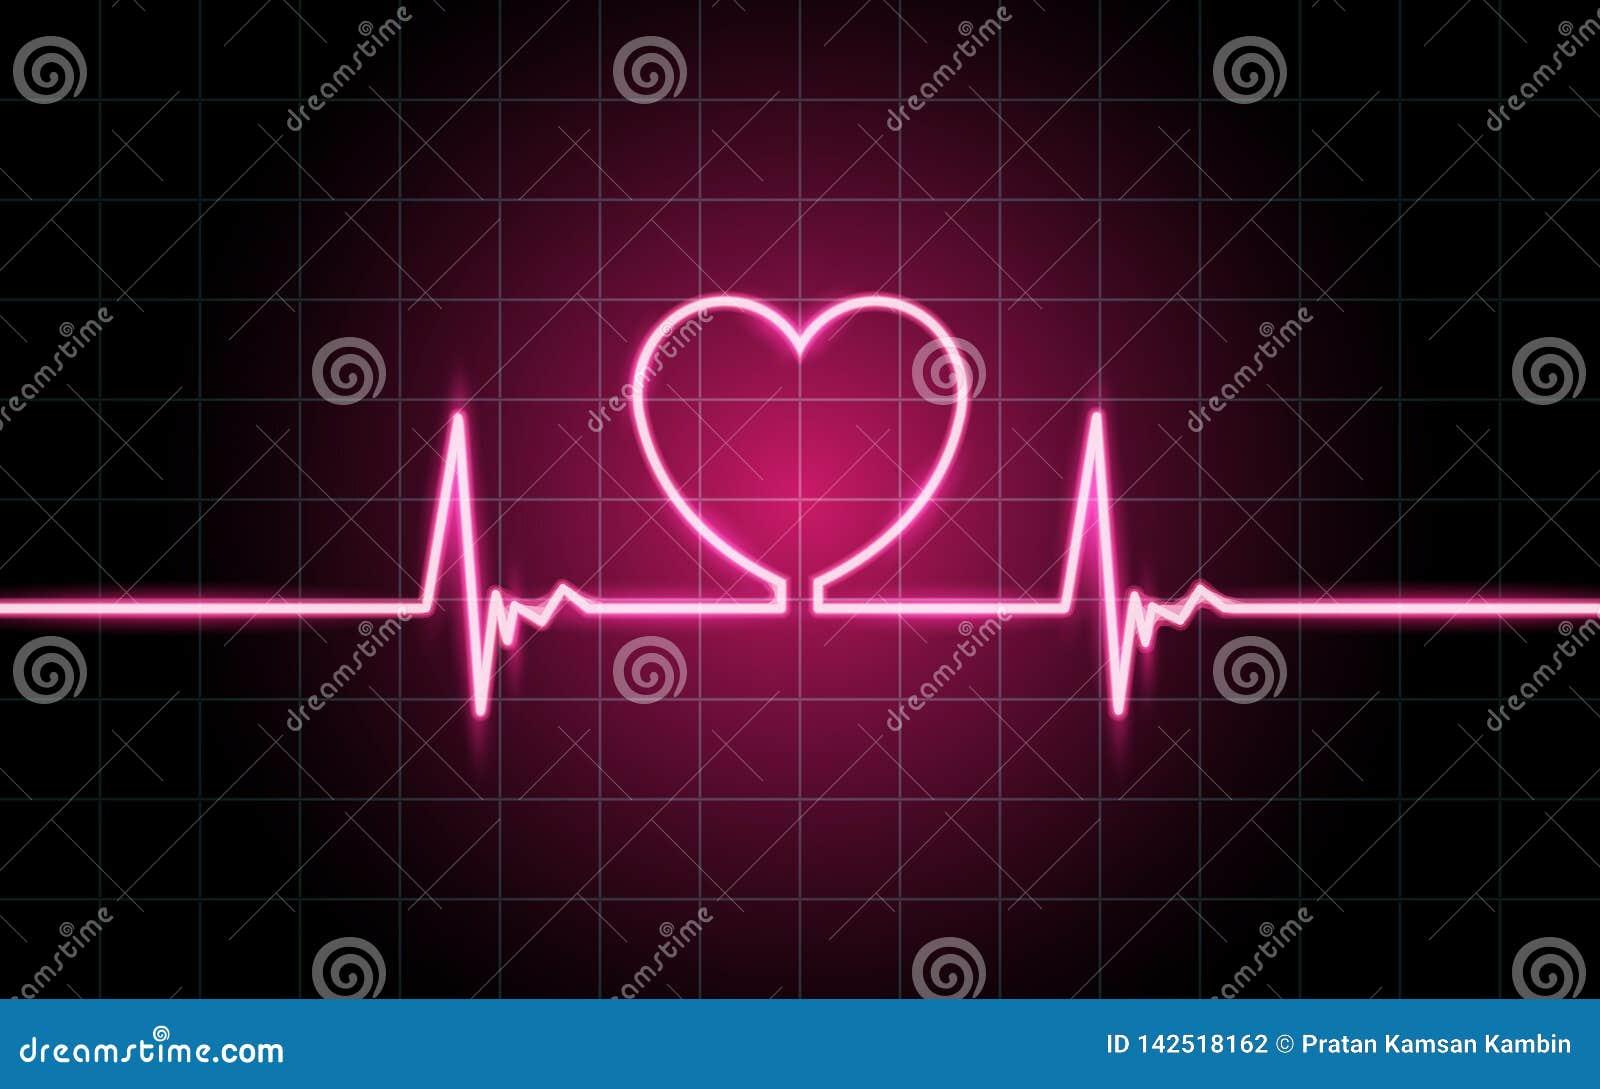 neon glowing lines heartbeat concept lifeline background wallpaper design 142518162